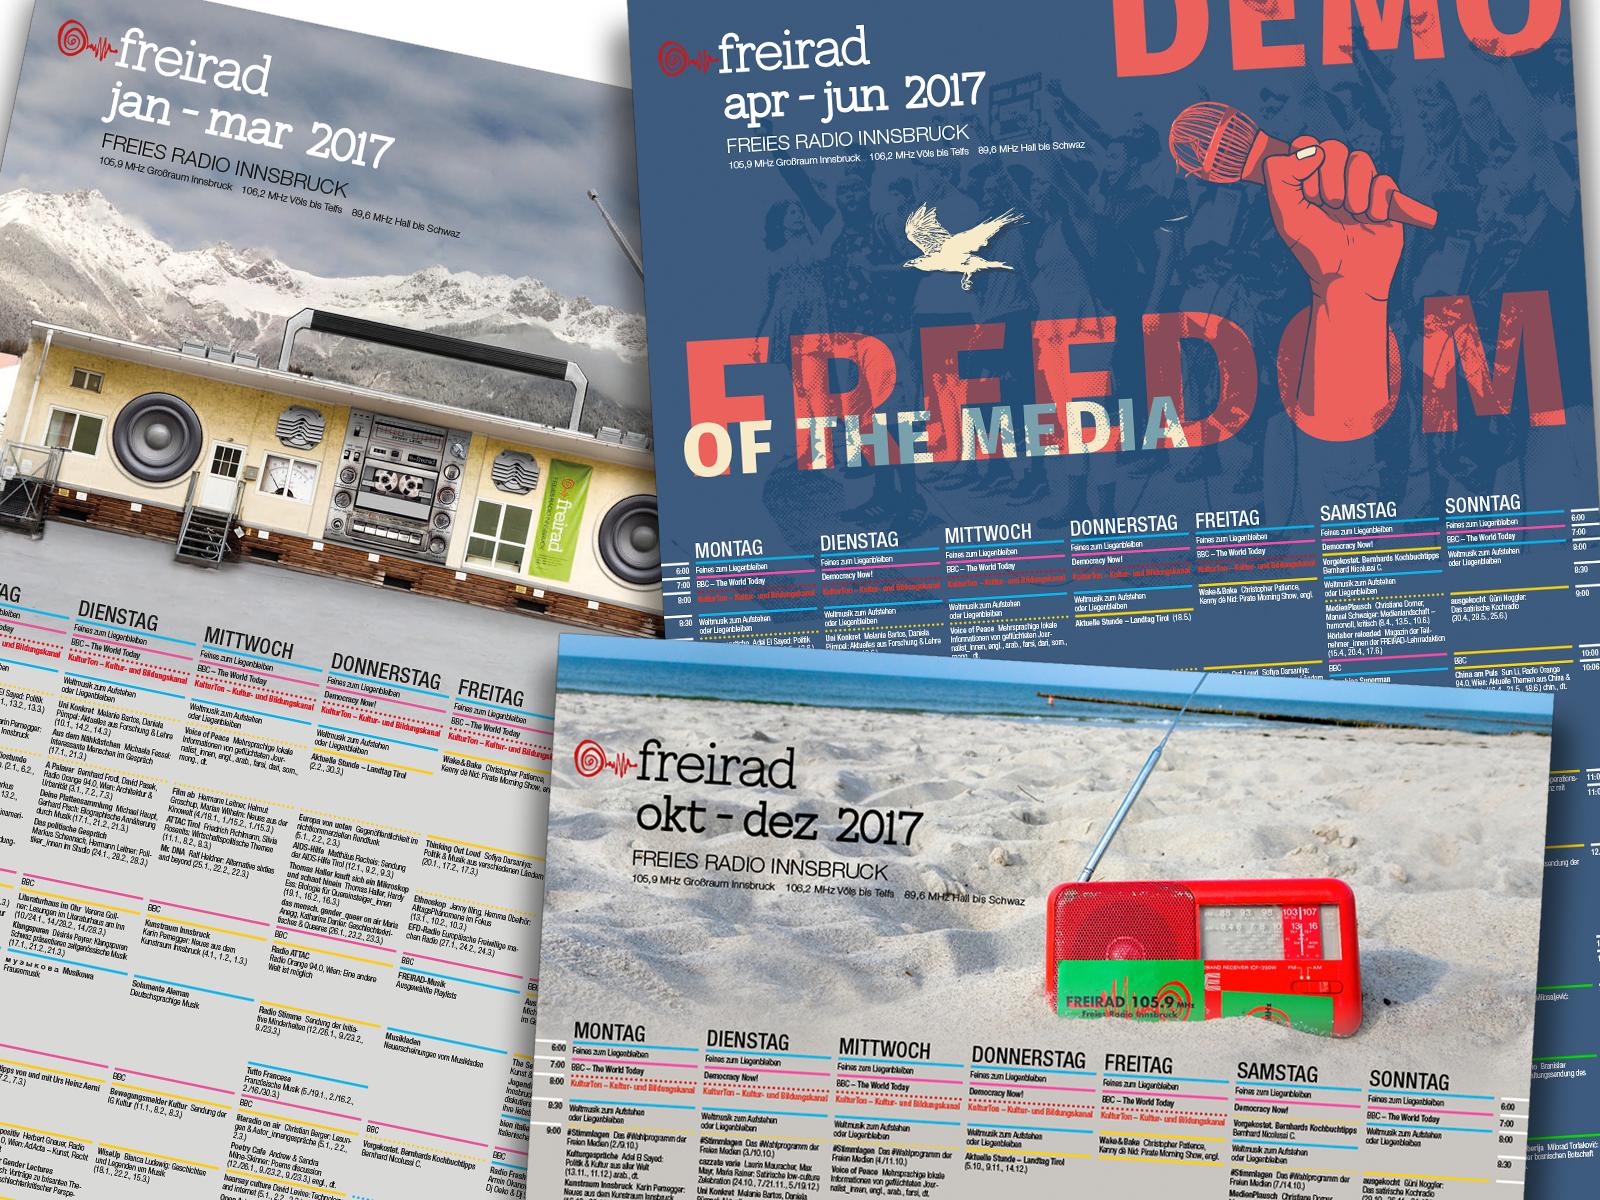 Freirad Programm 2017